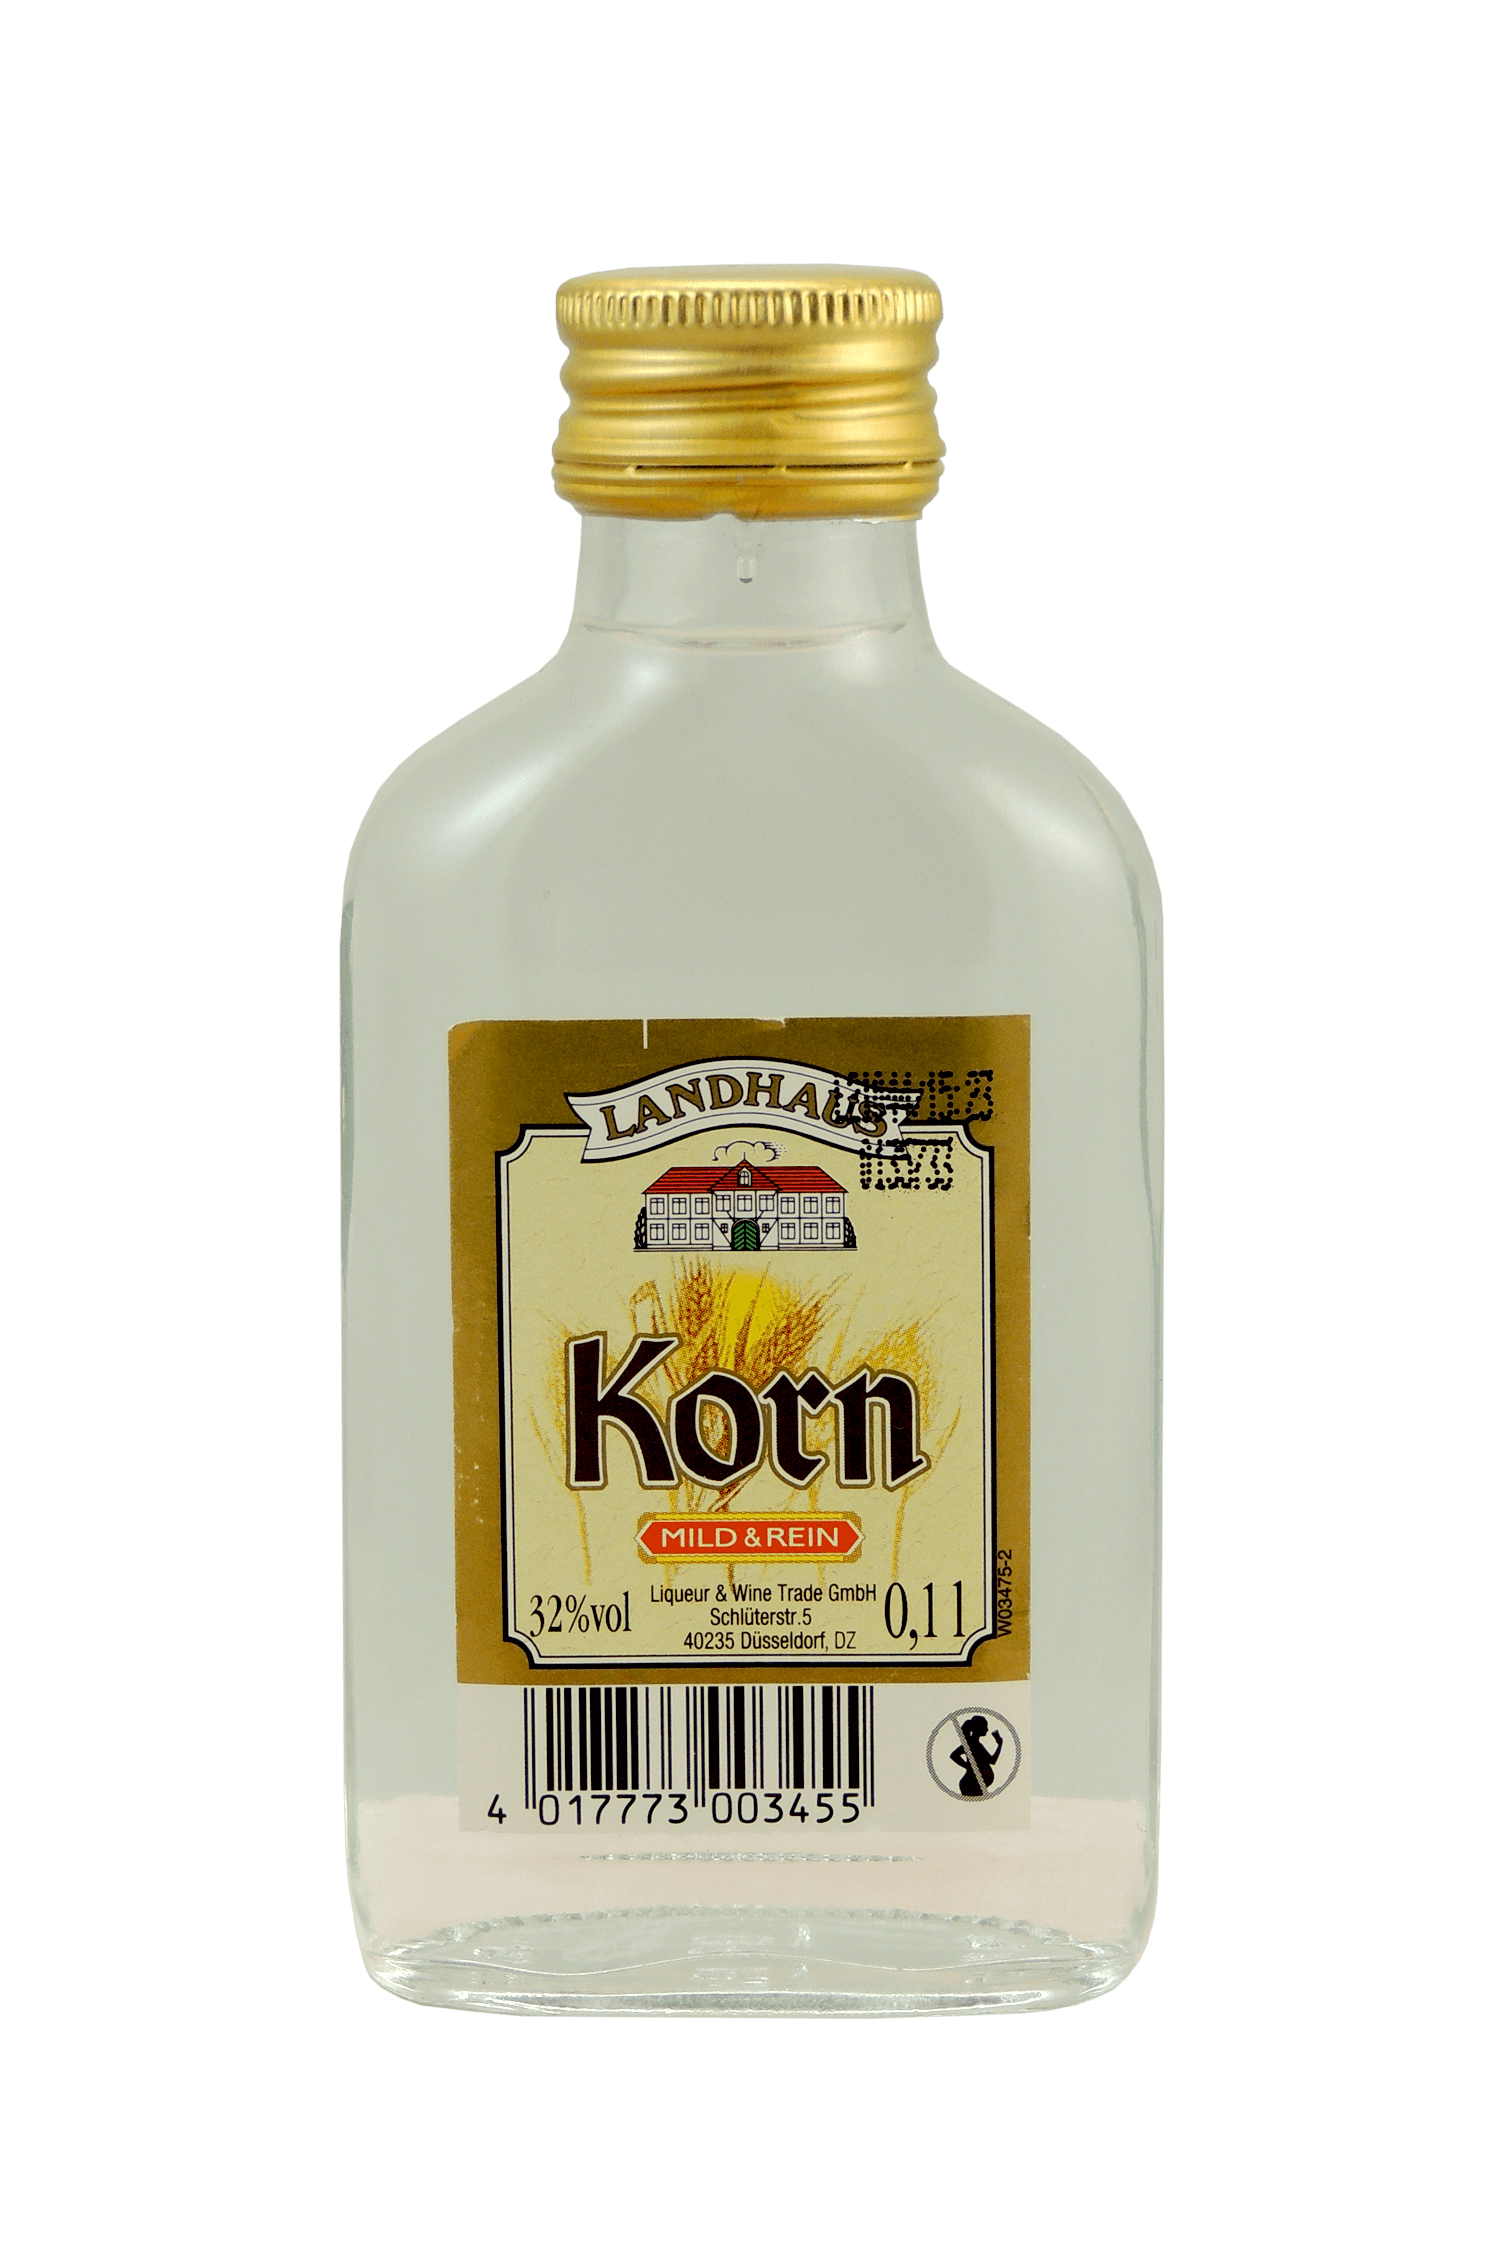 Korn Mild & Rein